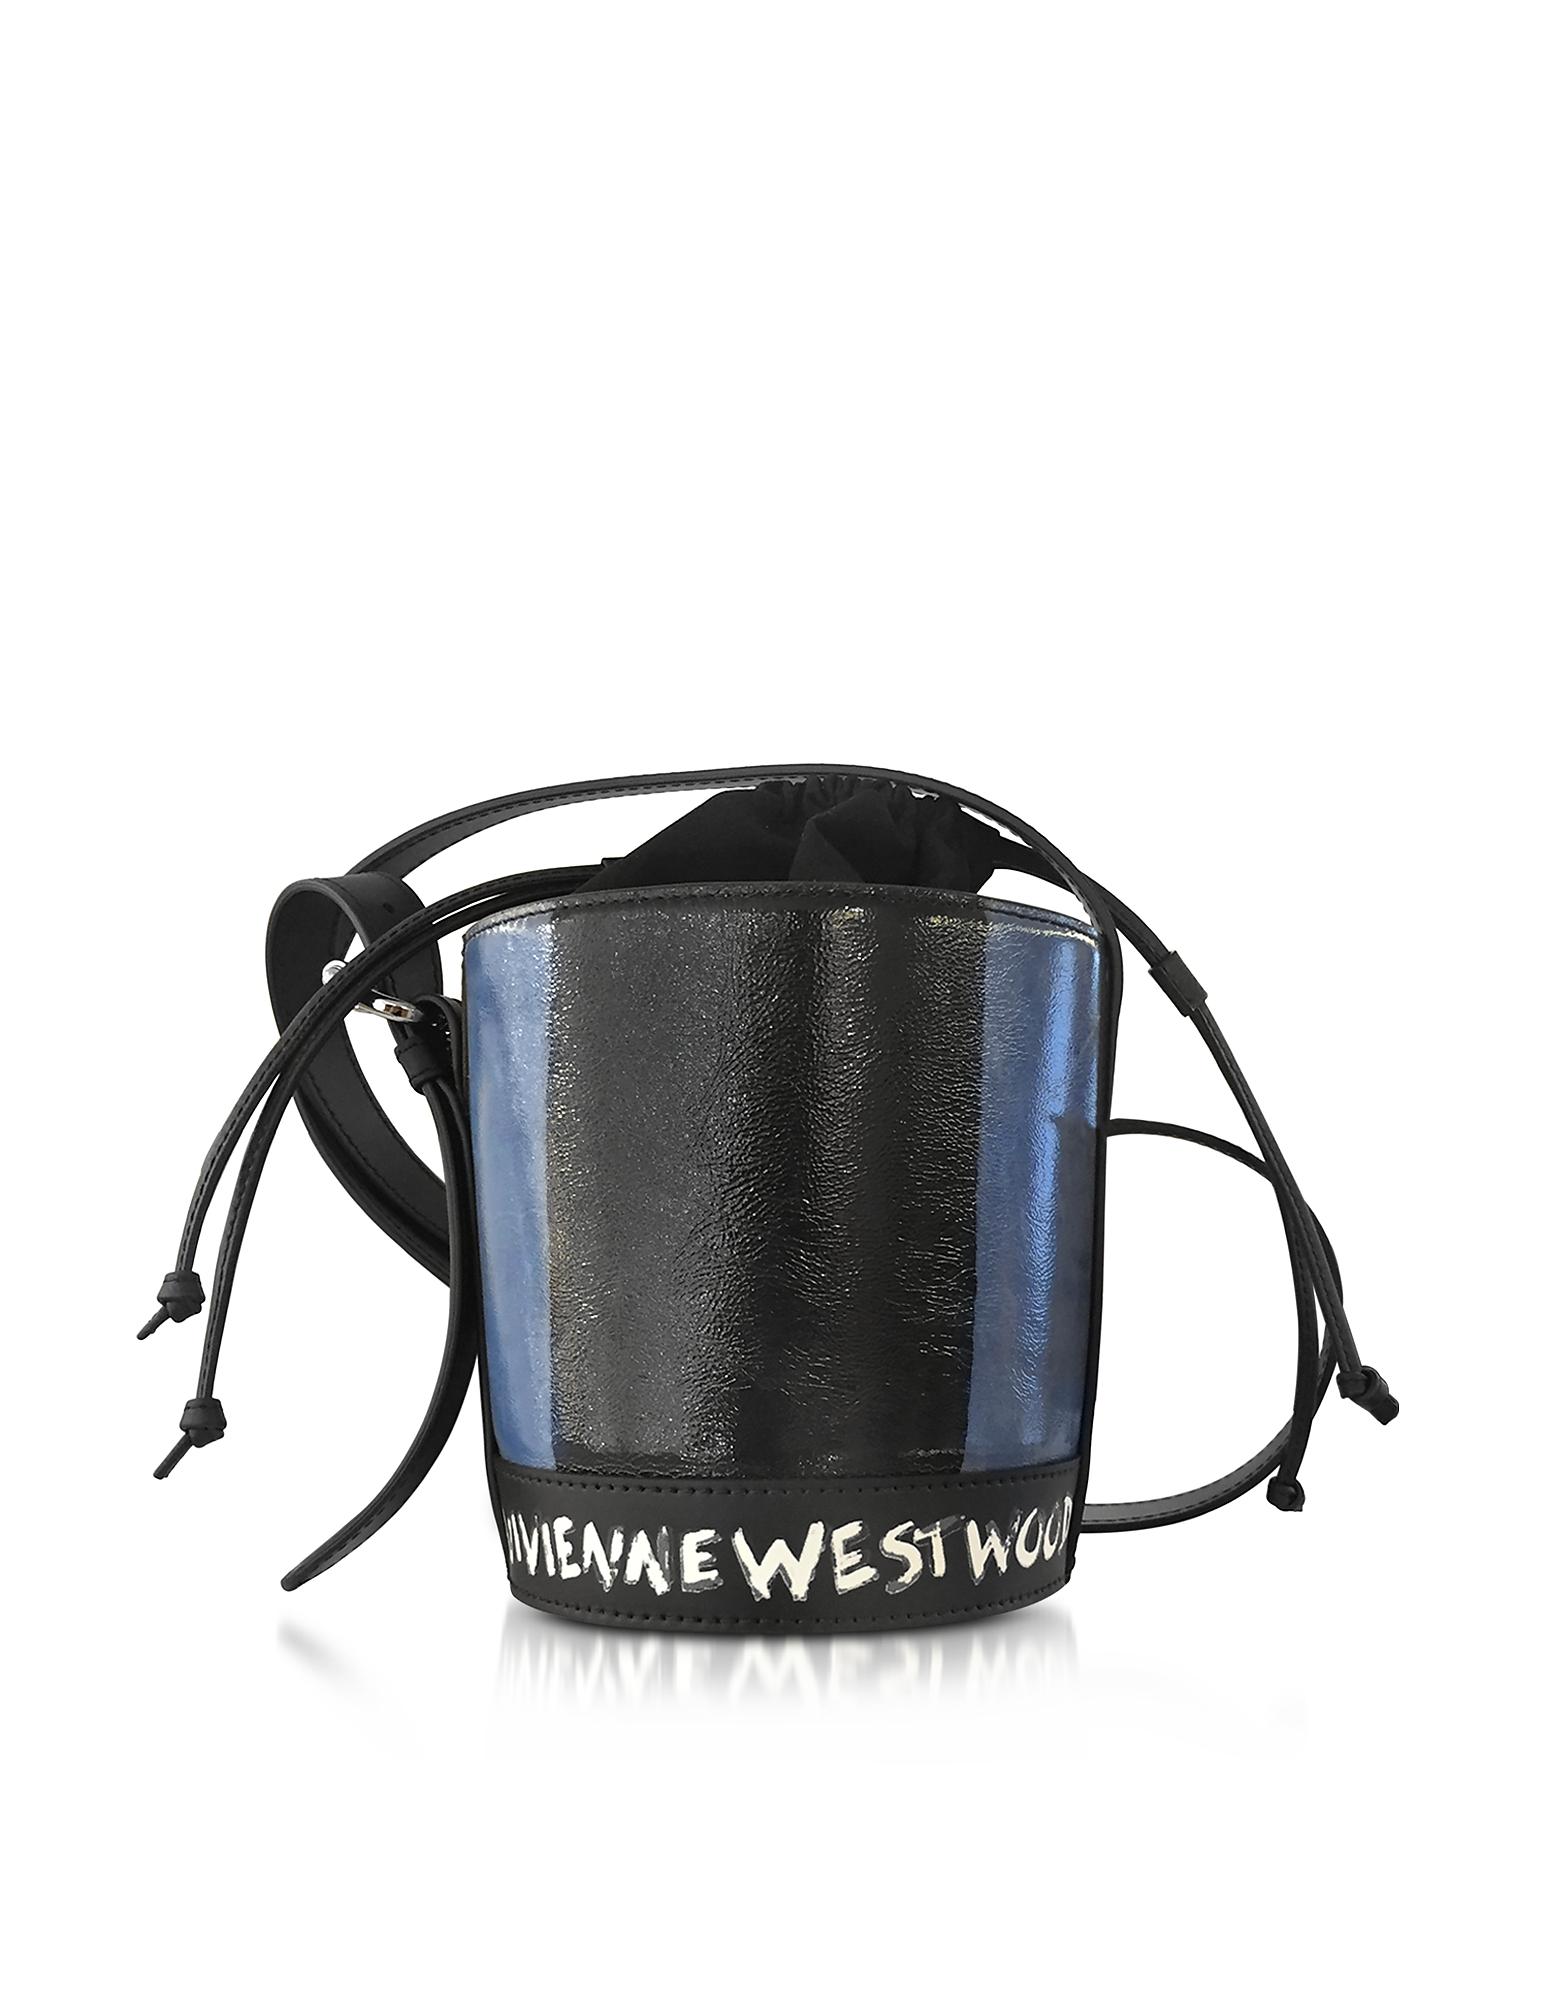 Vivienne Westwood Buckingham - Маленькая Фирменная Кожаная Сумка Ковш